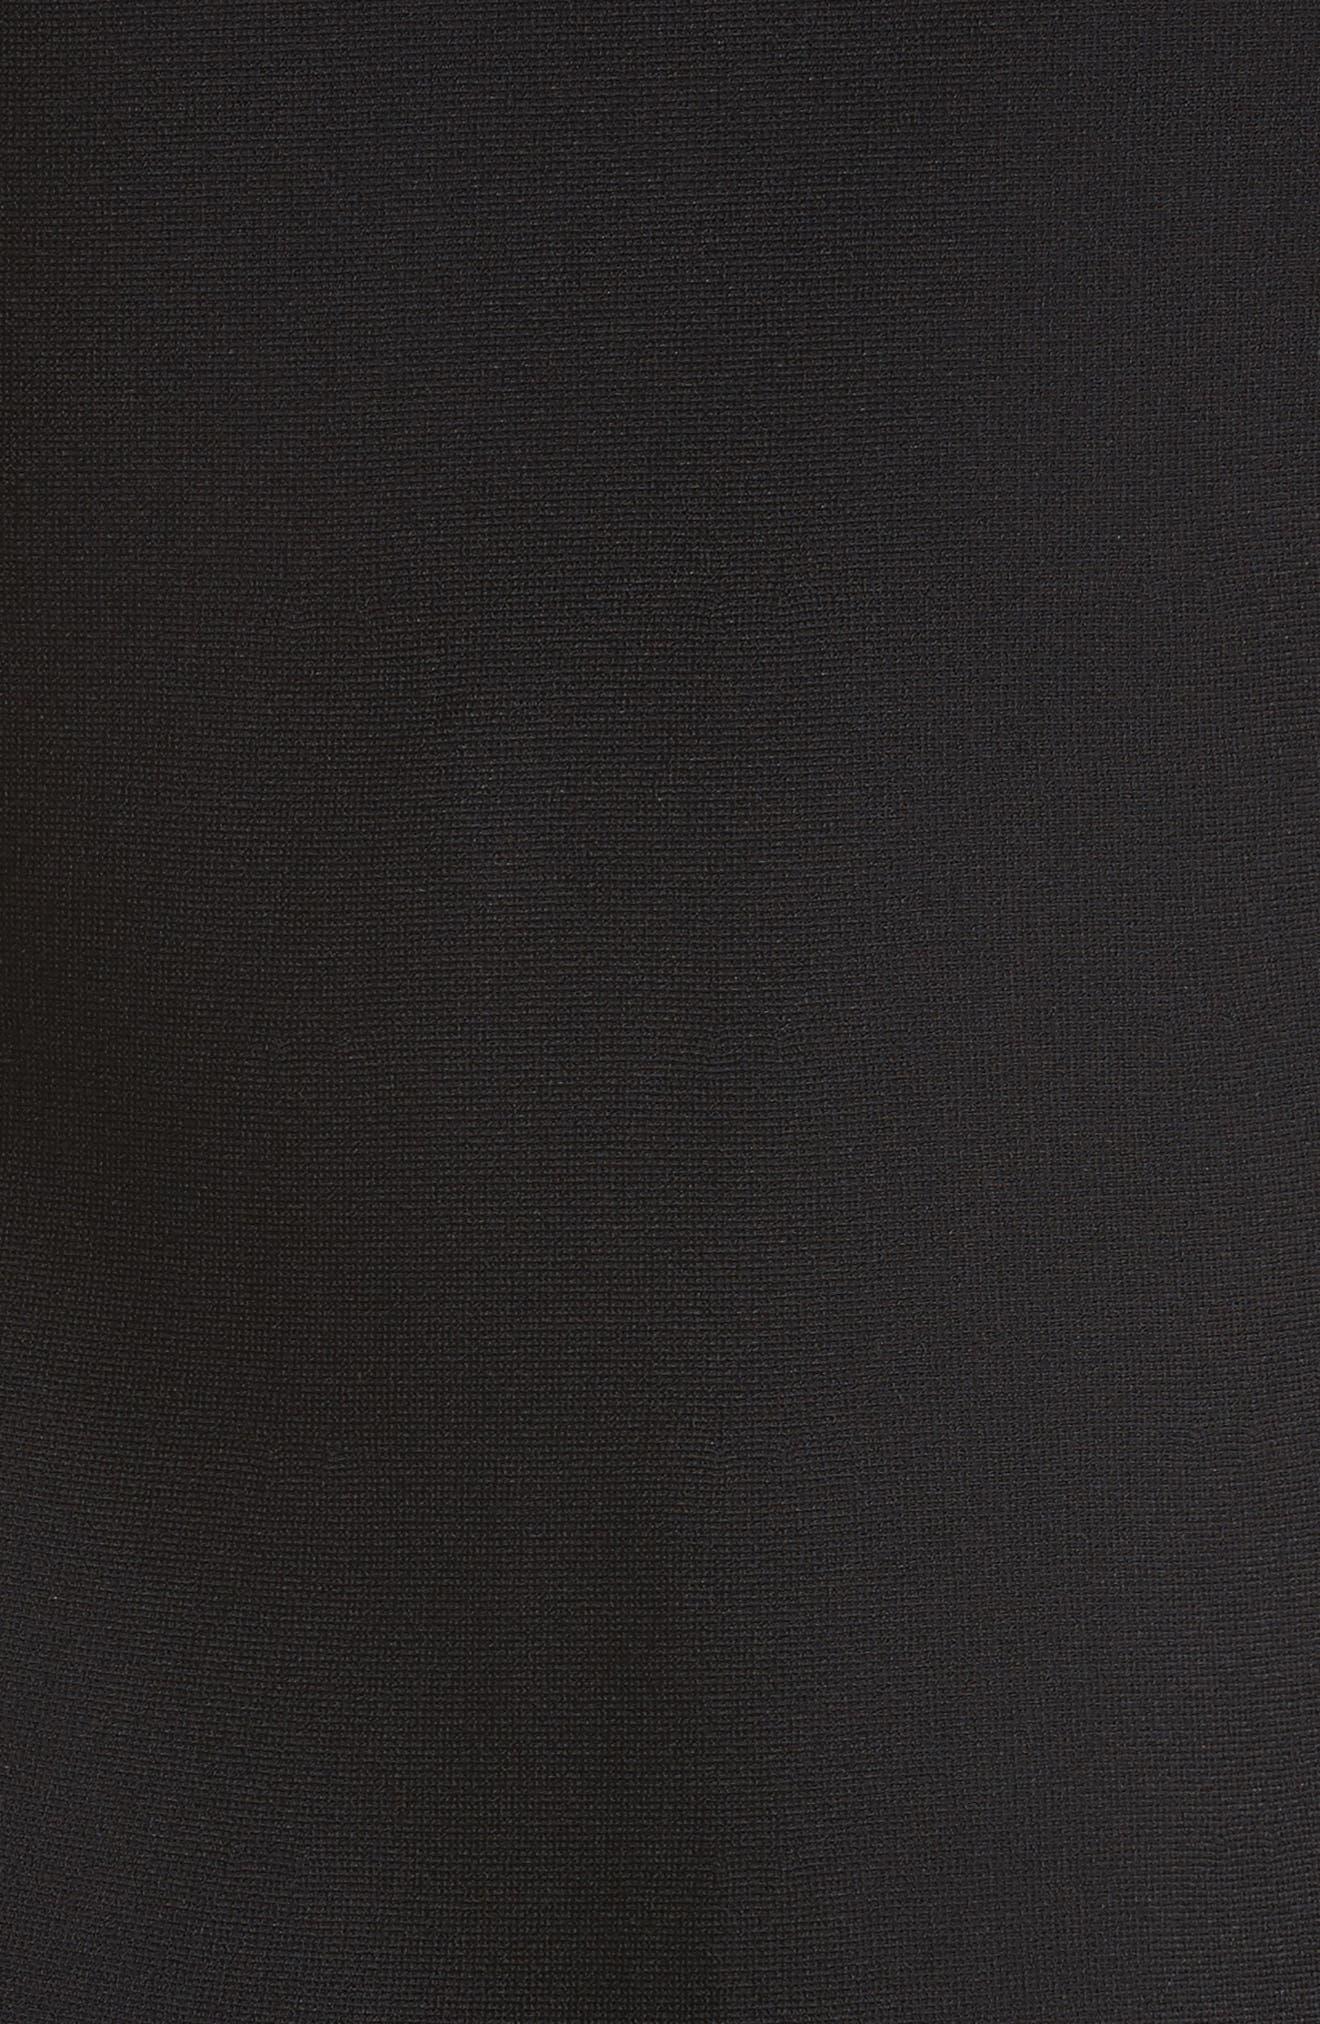 Chevron Lace Knit Dress,                             Alternate thumbnail 5, color,                             001